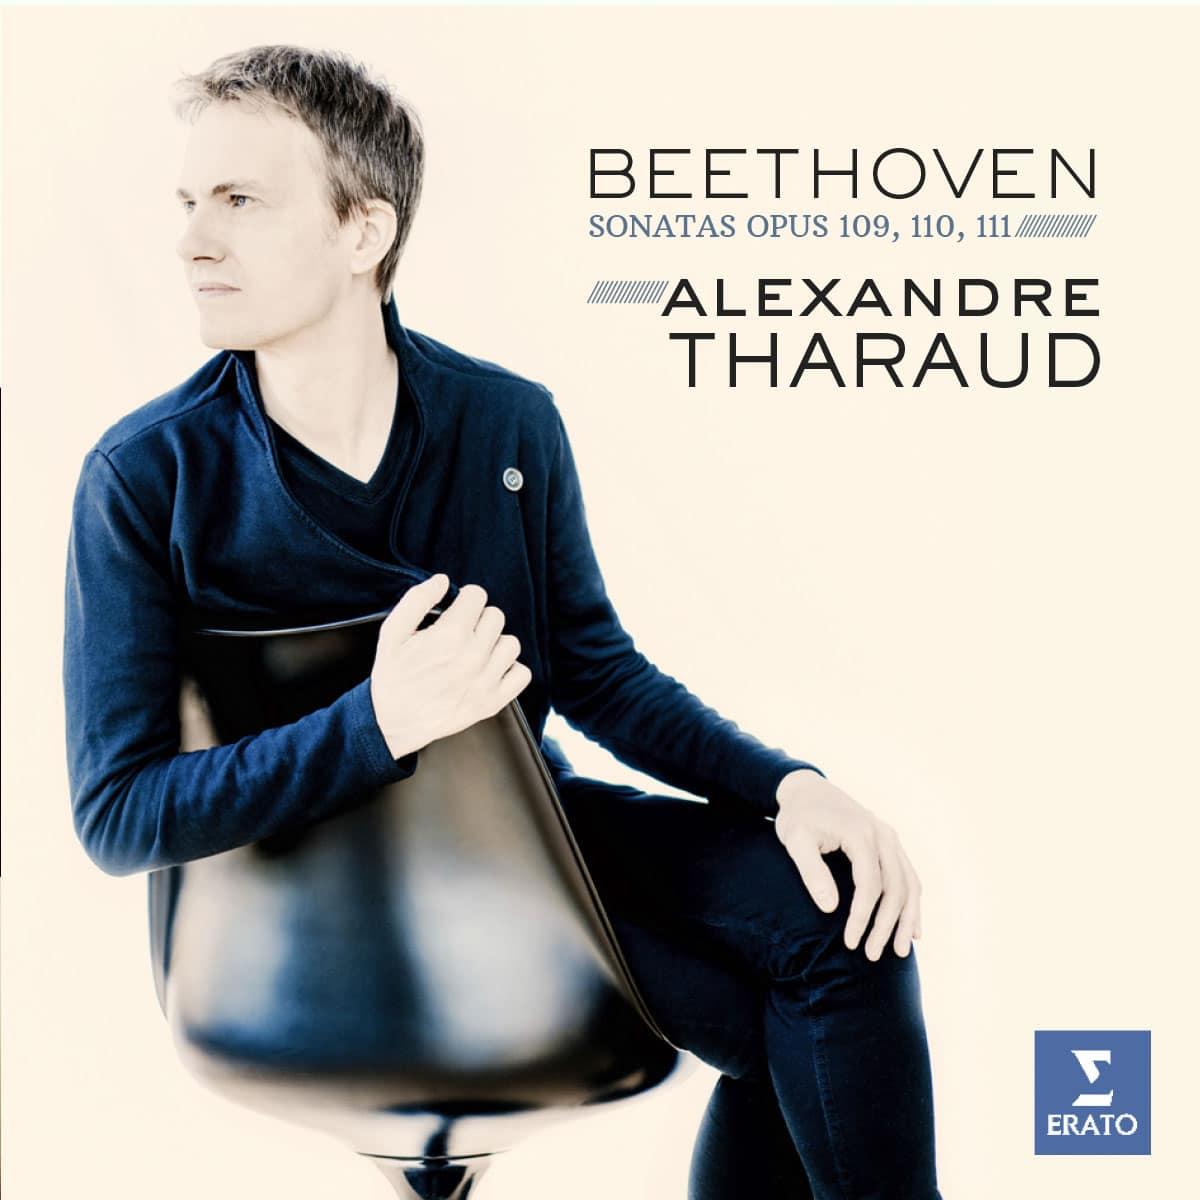 Beethoven, sonatas opus 109 110 111